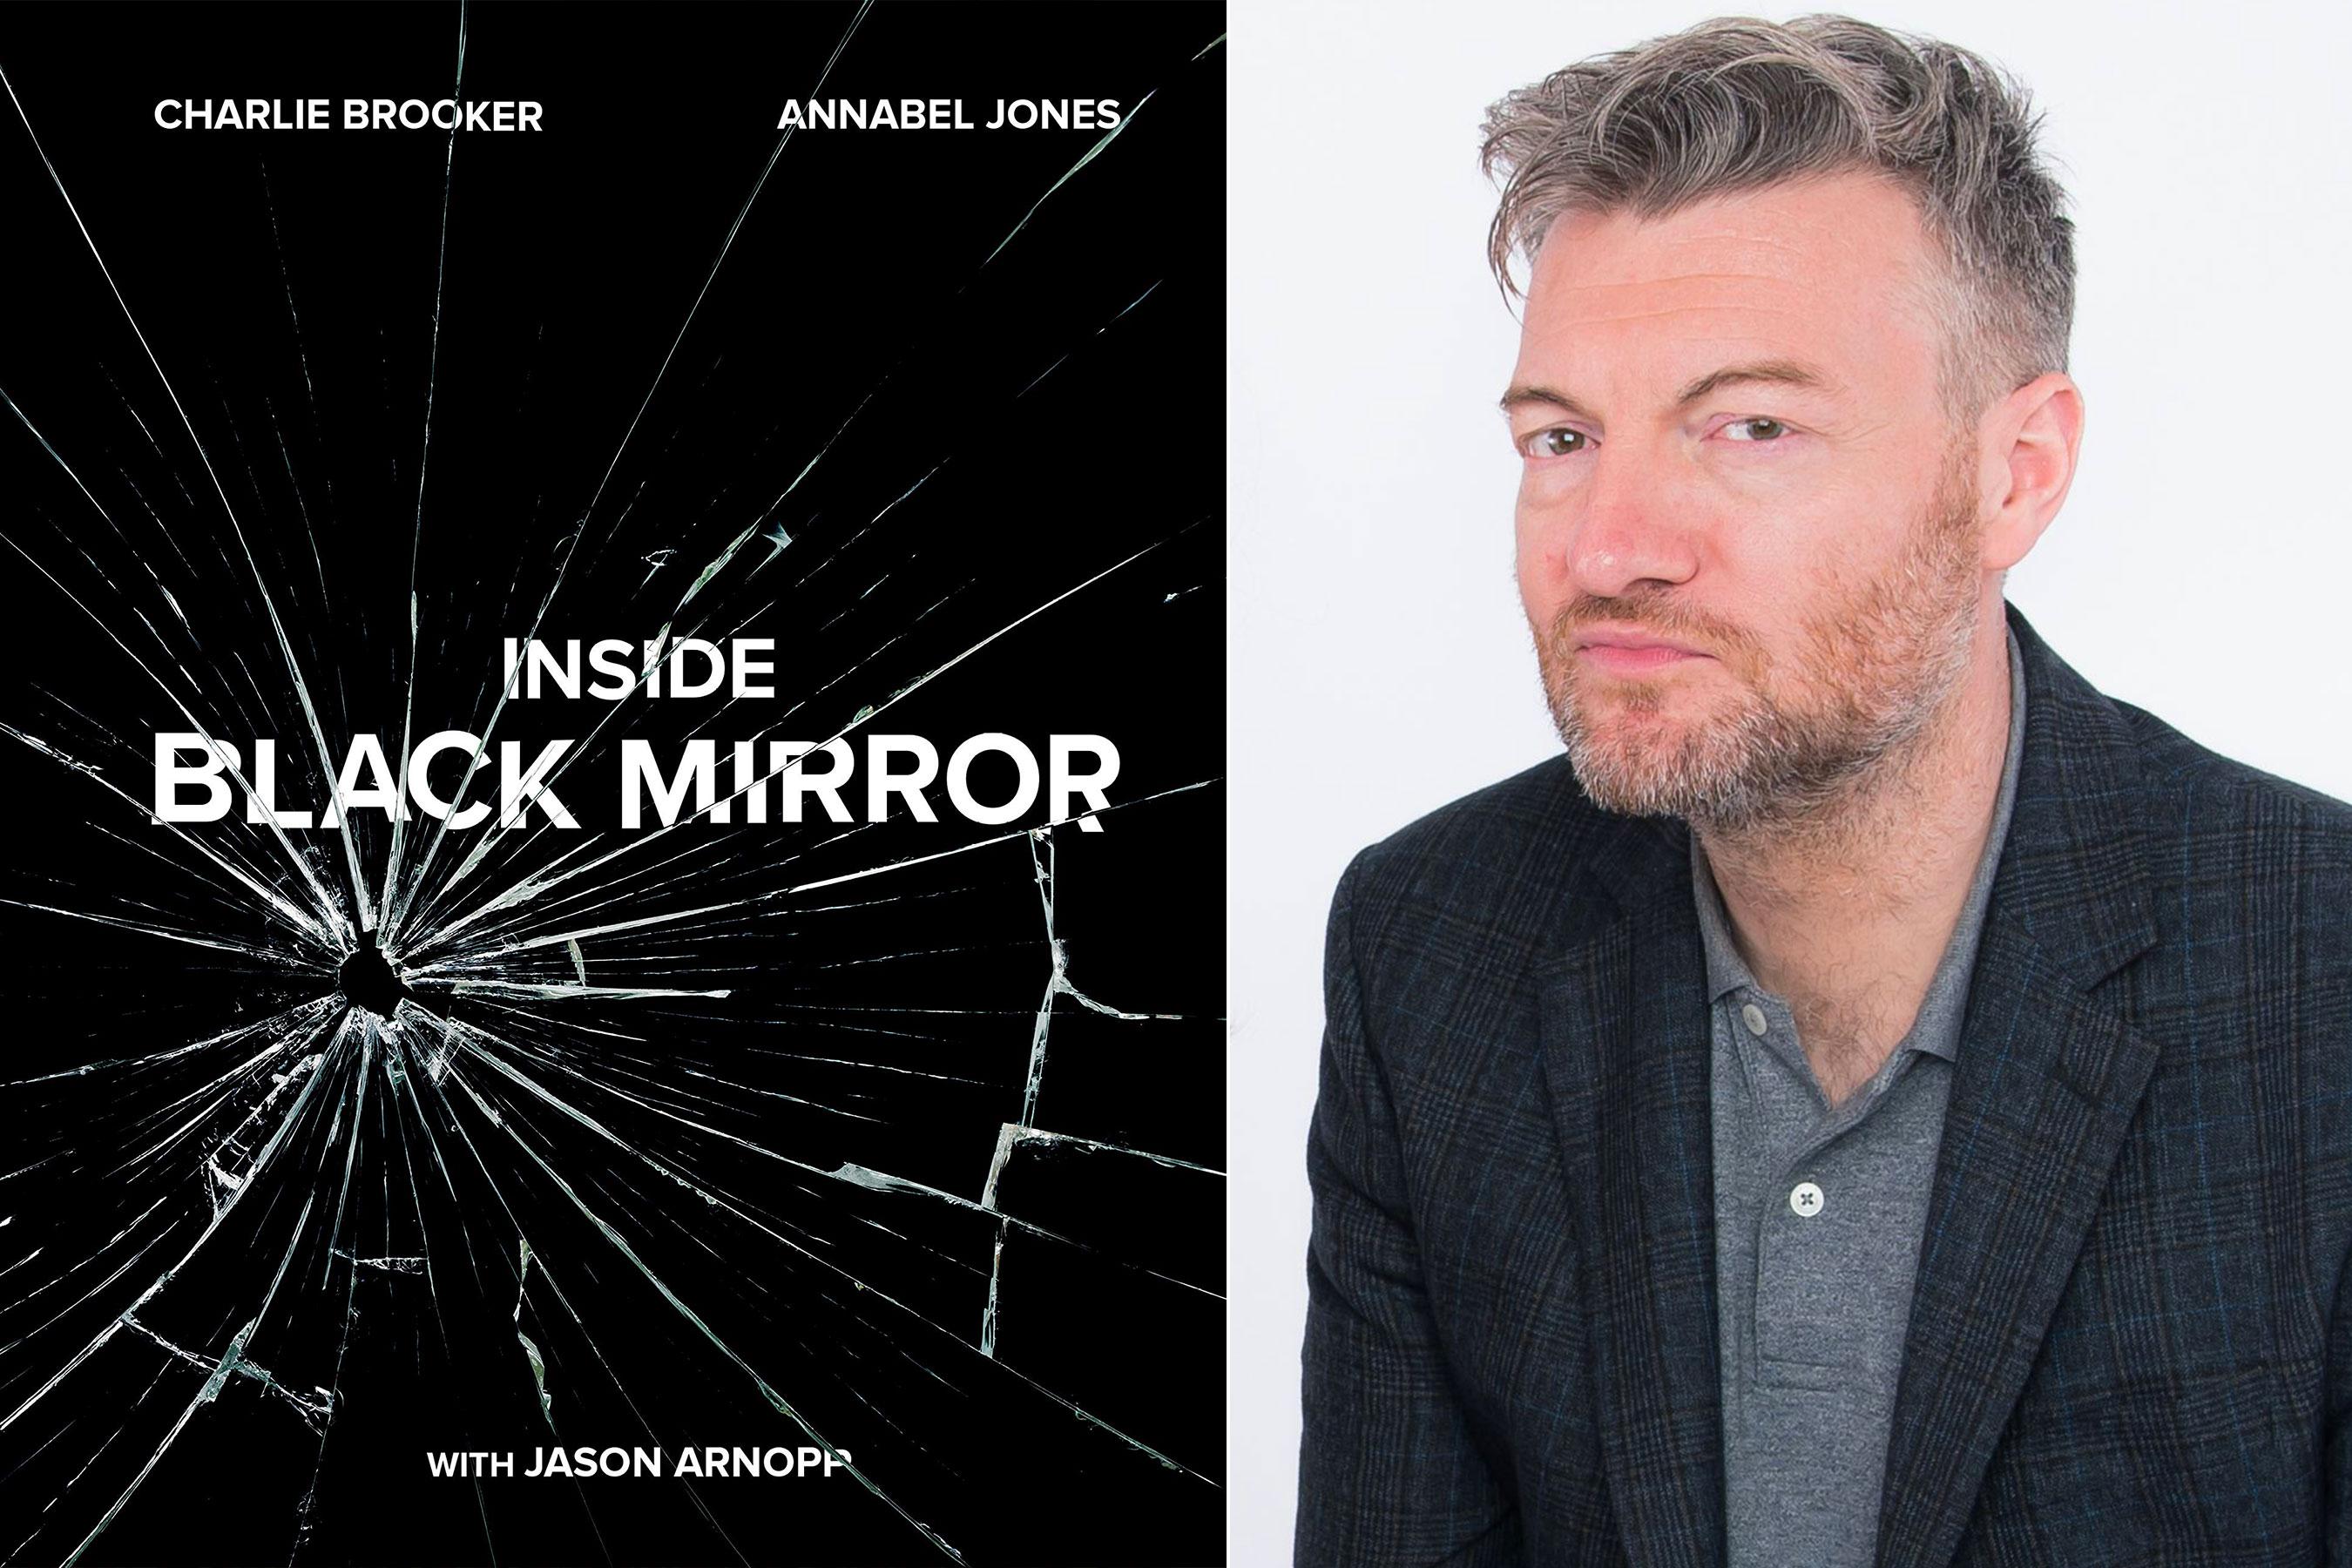 insideblackmirror